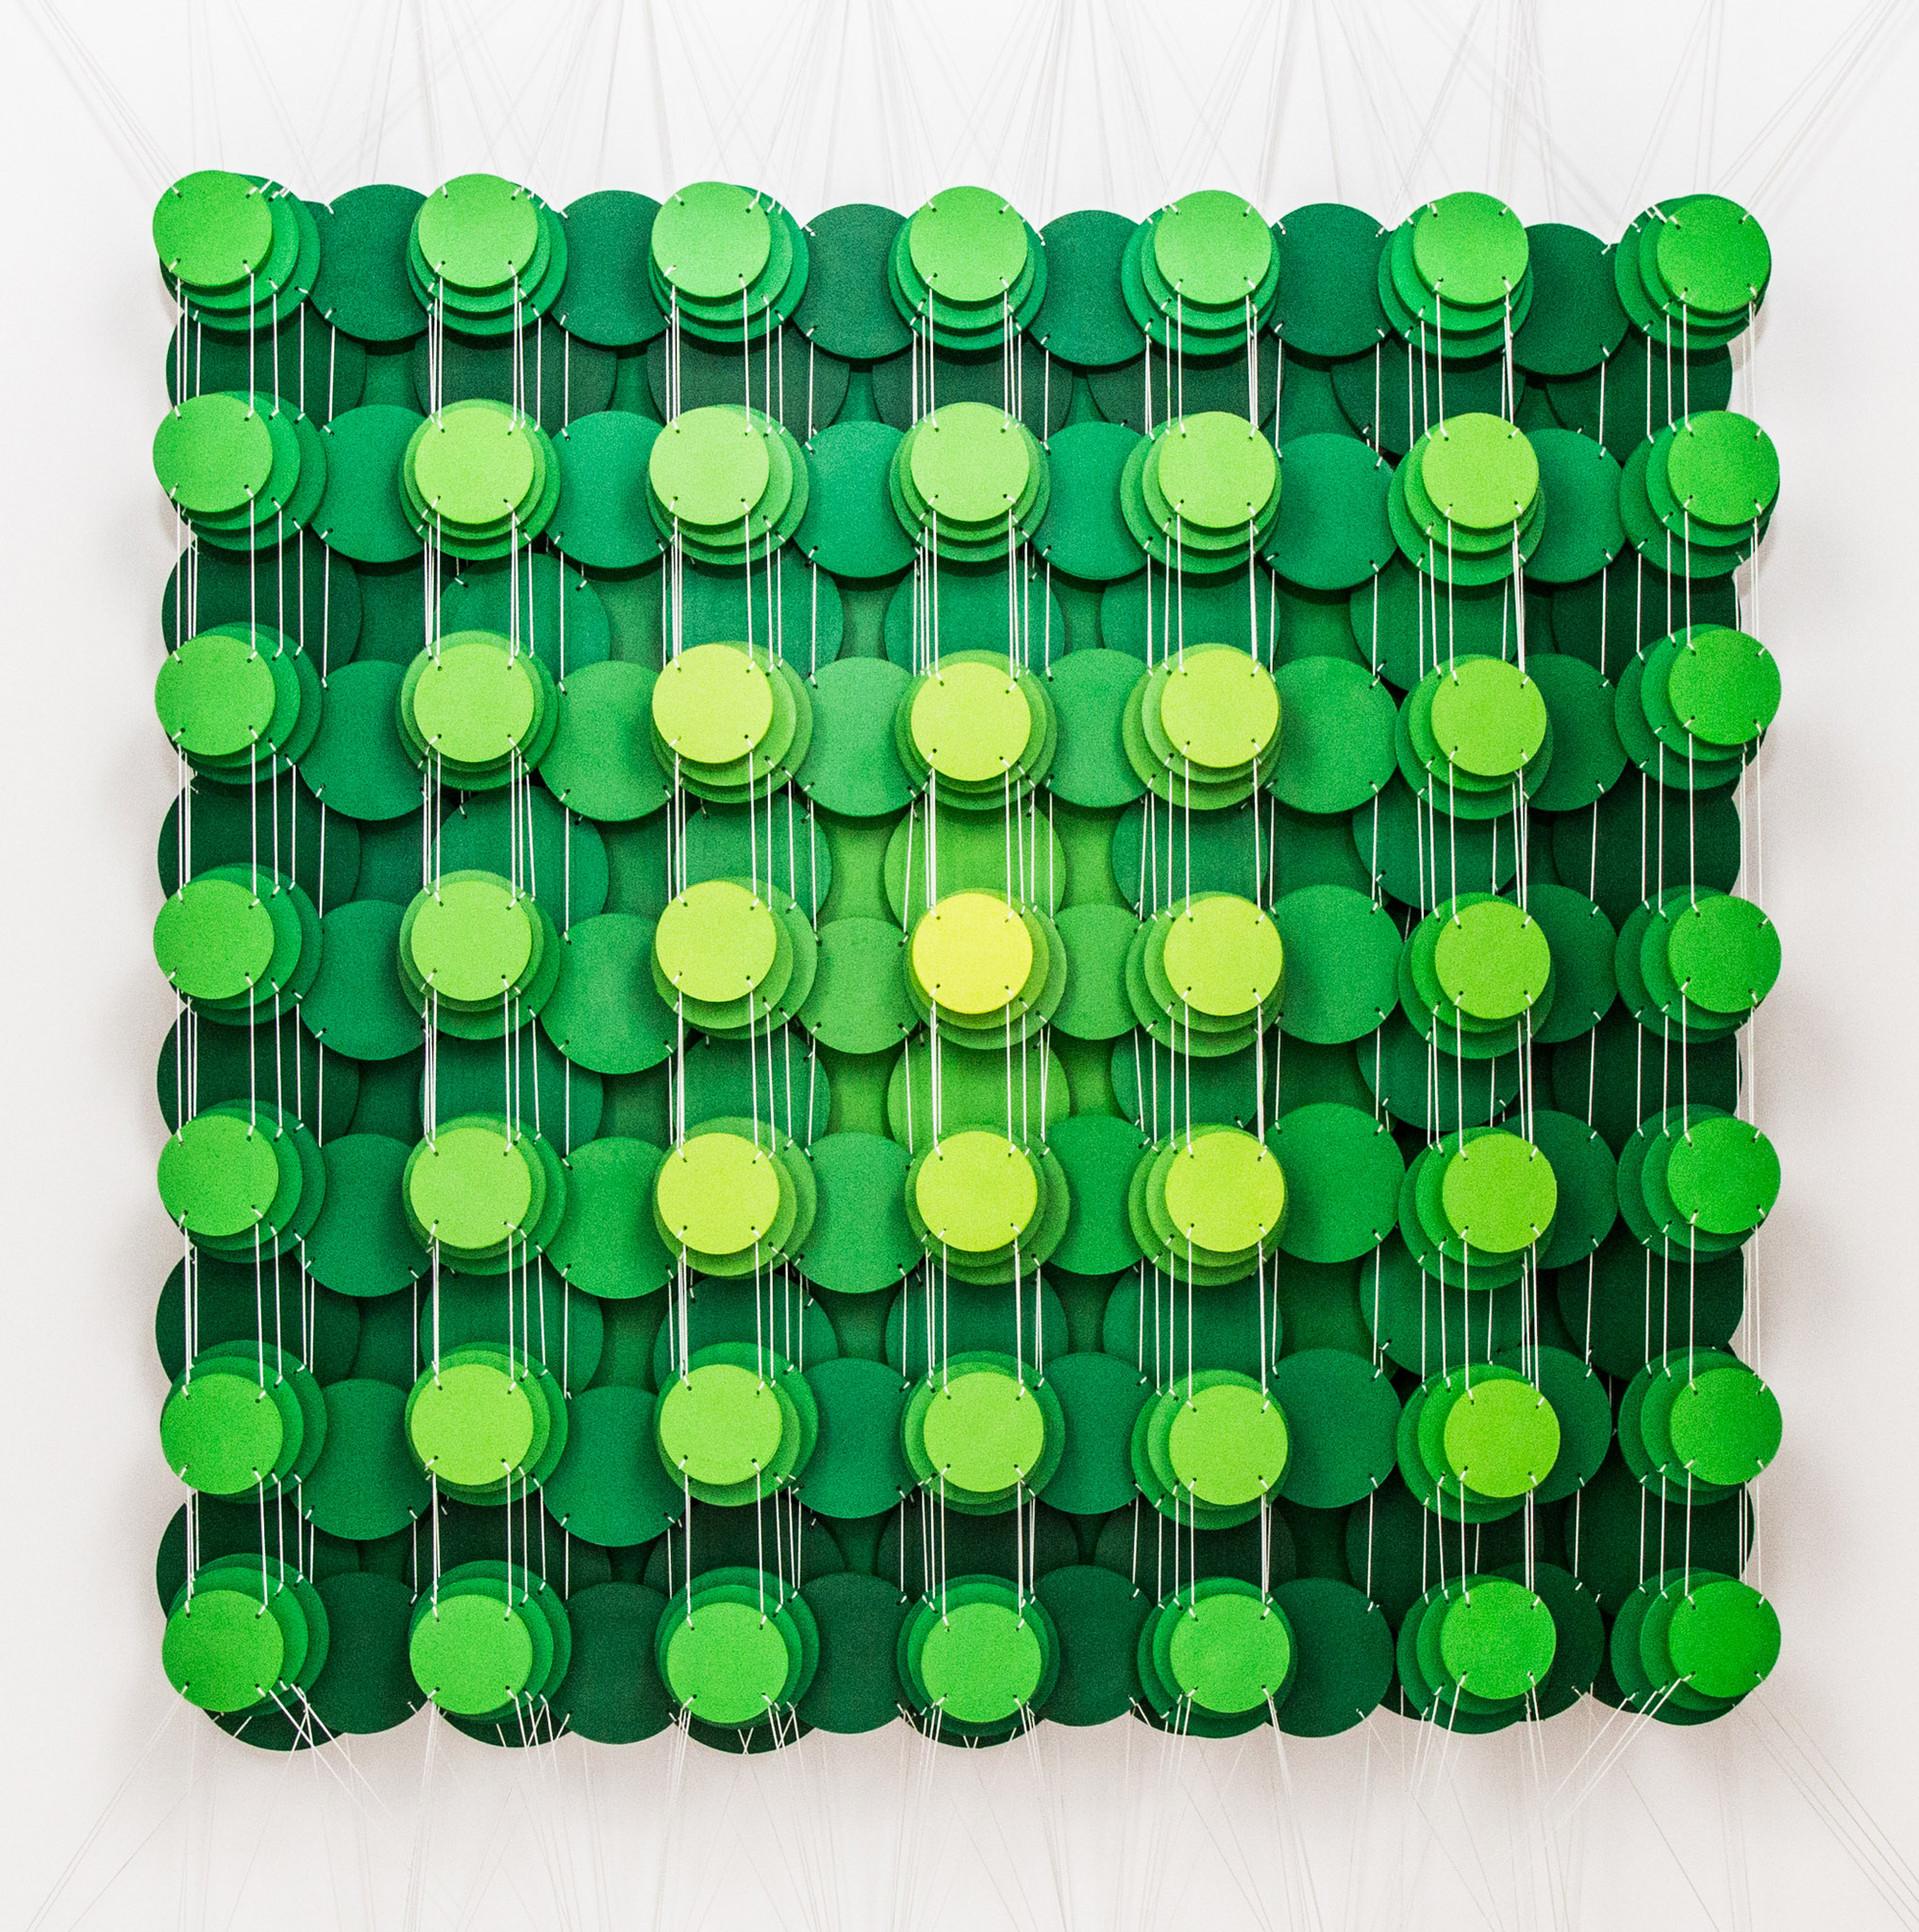 Cecilia Glazman Green popps 2017 Papel y madera pintado a mano e hilos (Hand painted paper and wood, thread) 100 x 100 cm.